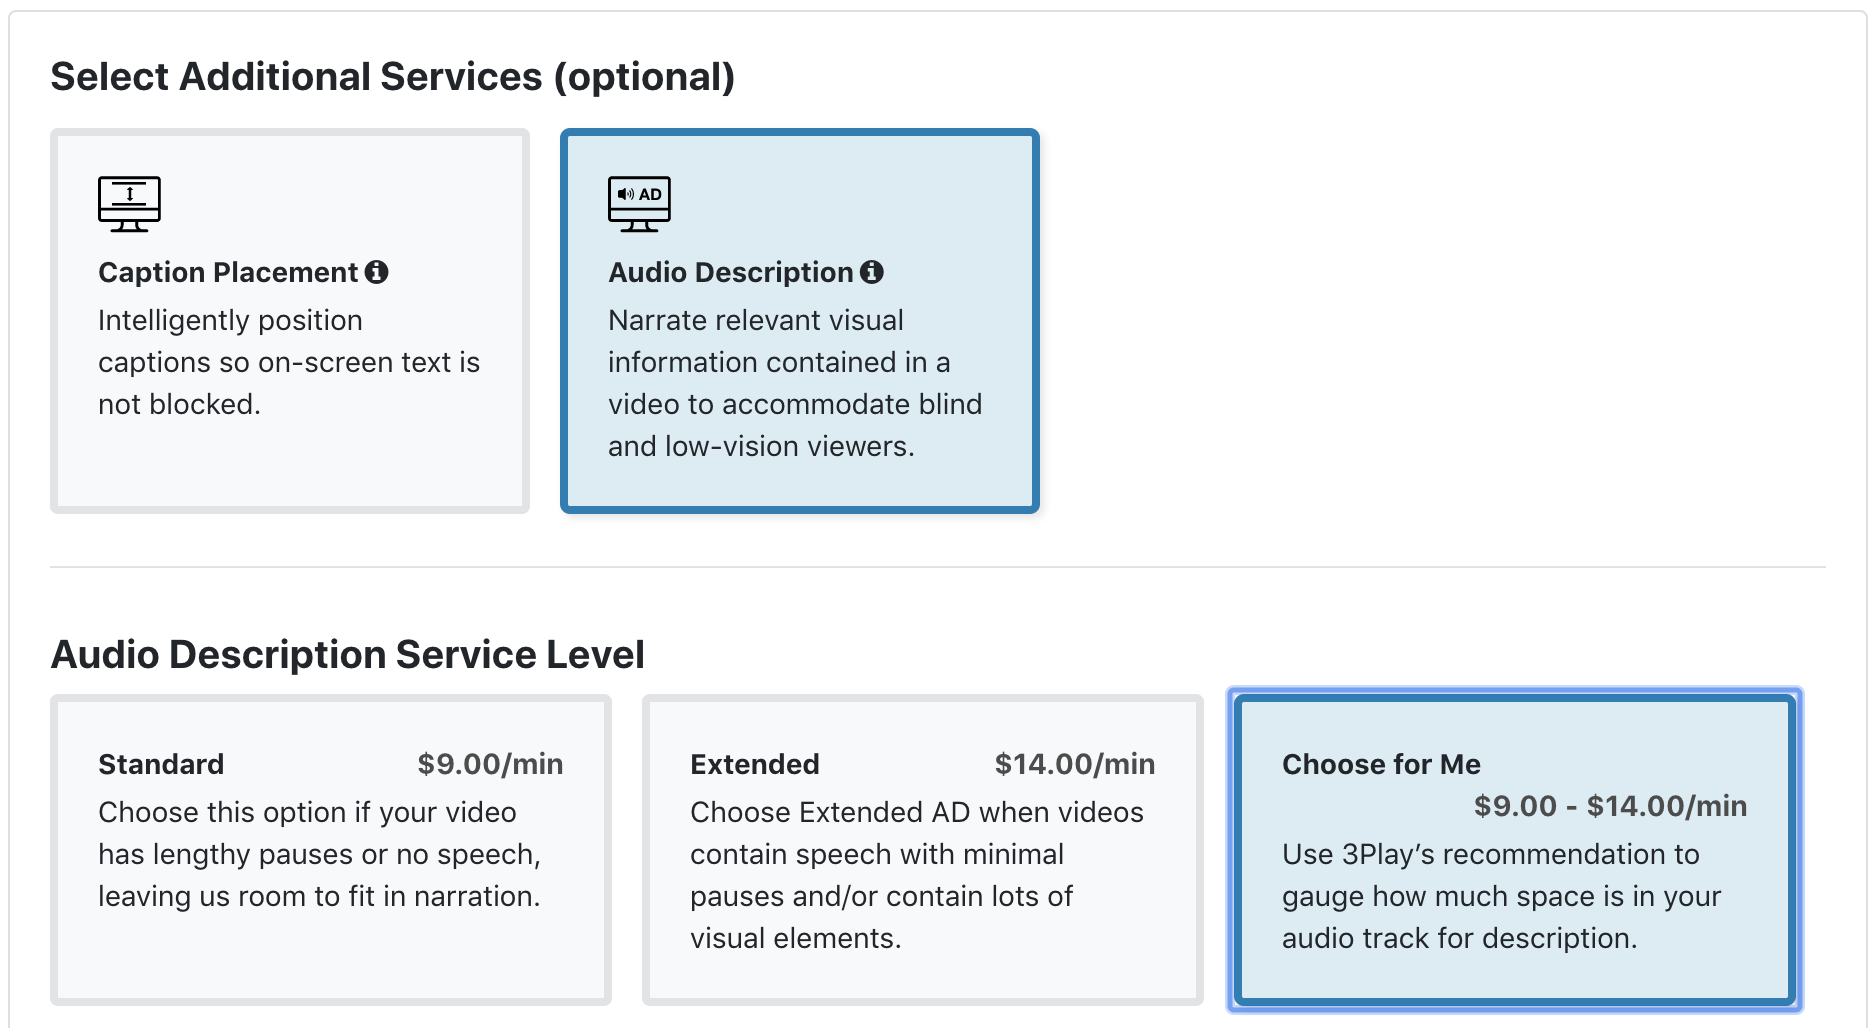 Dropdown of audio description services shows Use 3Play's Recommendation